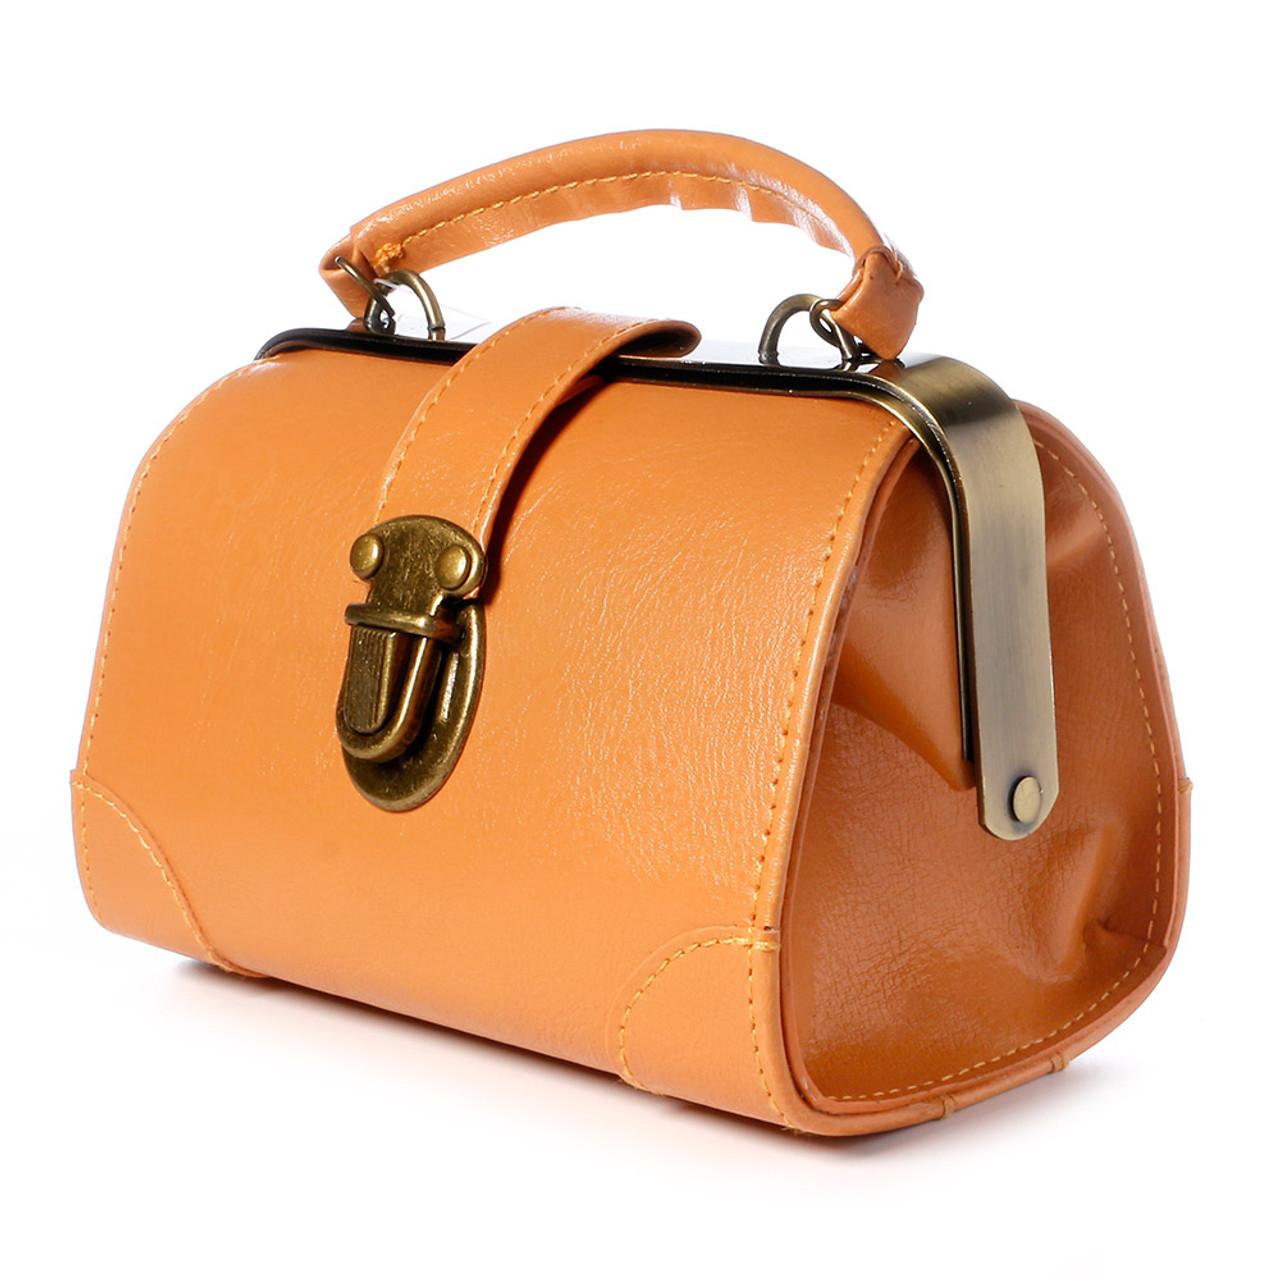 Seto Craft Motif Mini Doctor Bag Shape Pouch / Cosmetic Bag - Camel Color ( Side View )